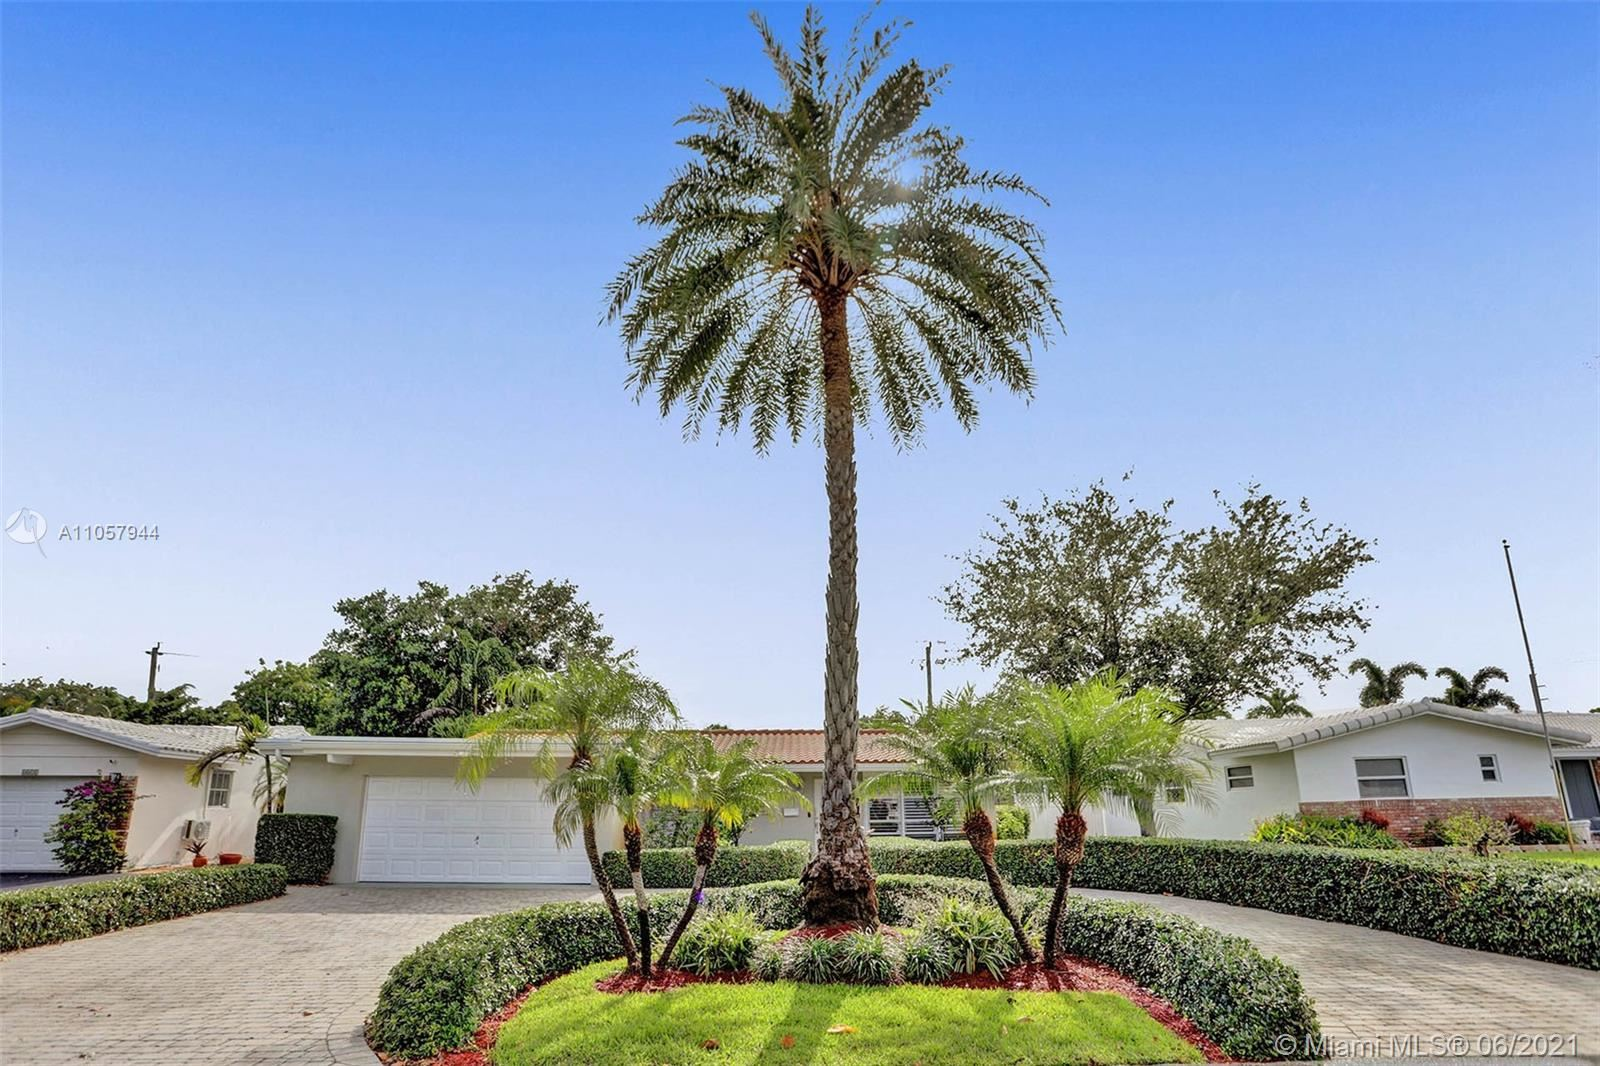 6631 NE 21st Ave, Fort Lauderdale, FL 33308 - #: A11057944